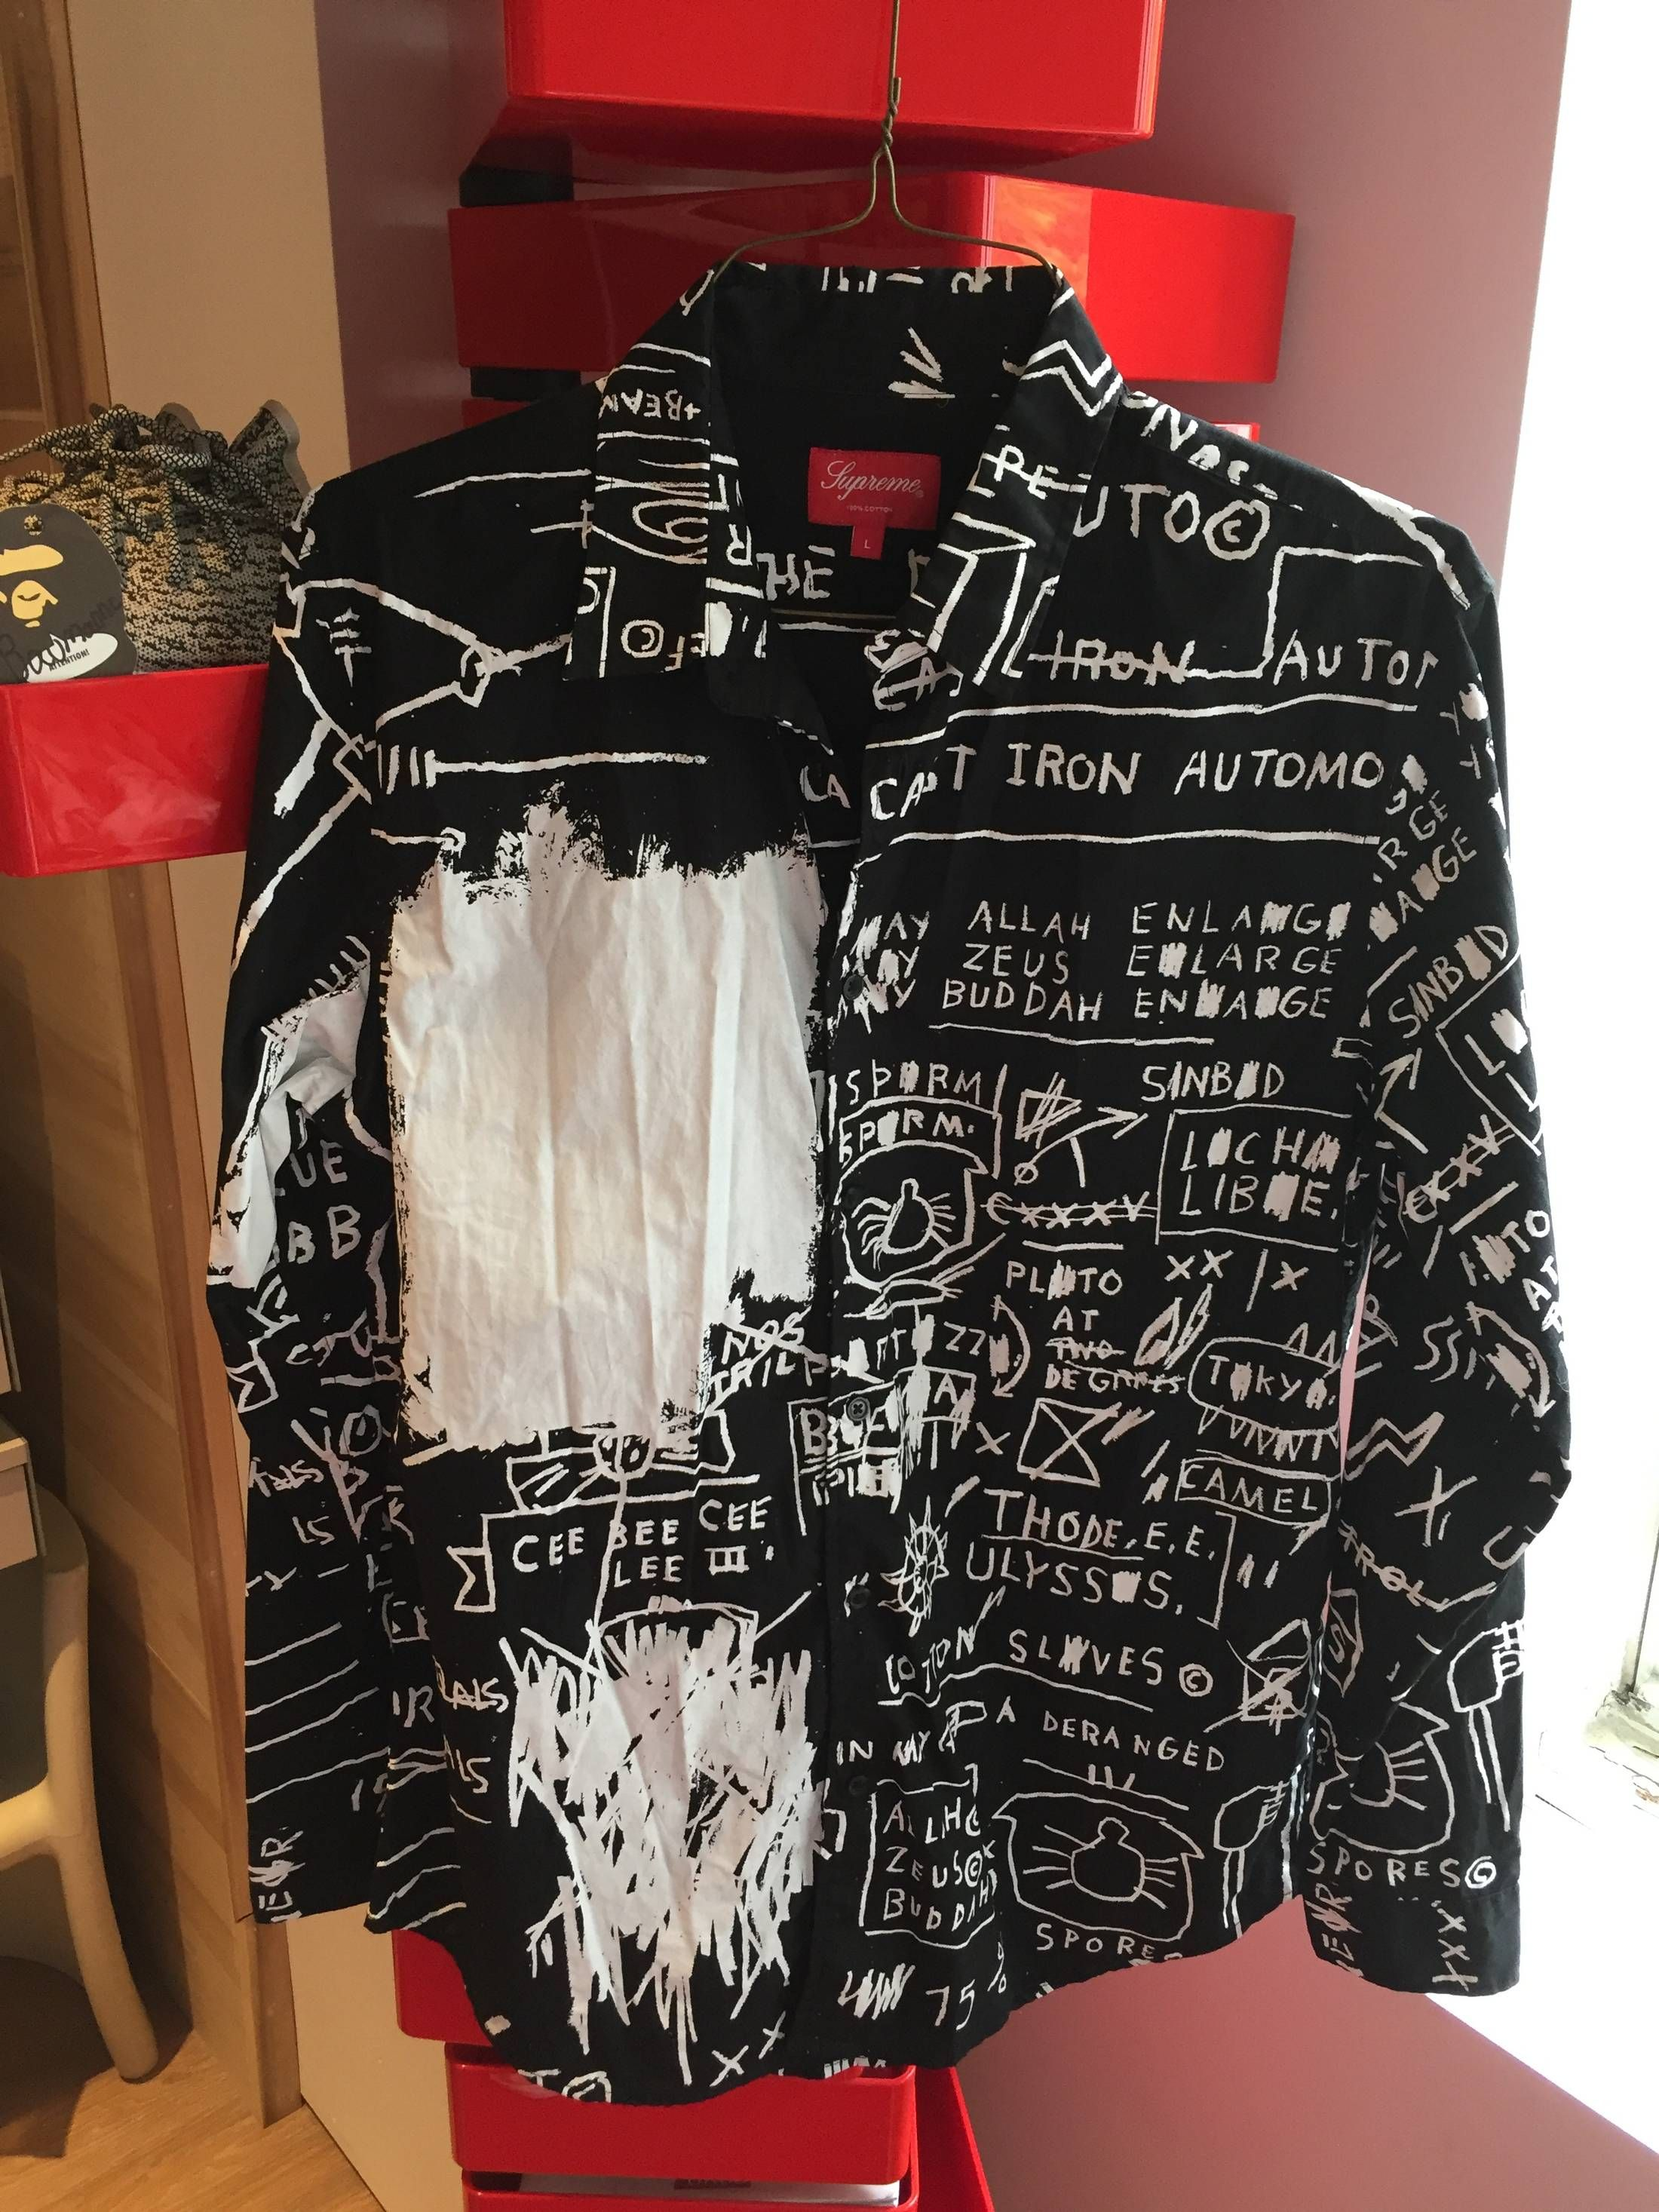 Supreme Supreme Basquiat Shirt Button Up Black Cool Outfits Aesthetic Clothes Diy Clothes